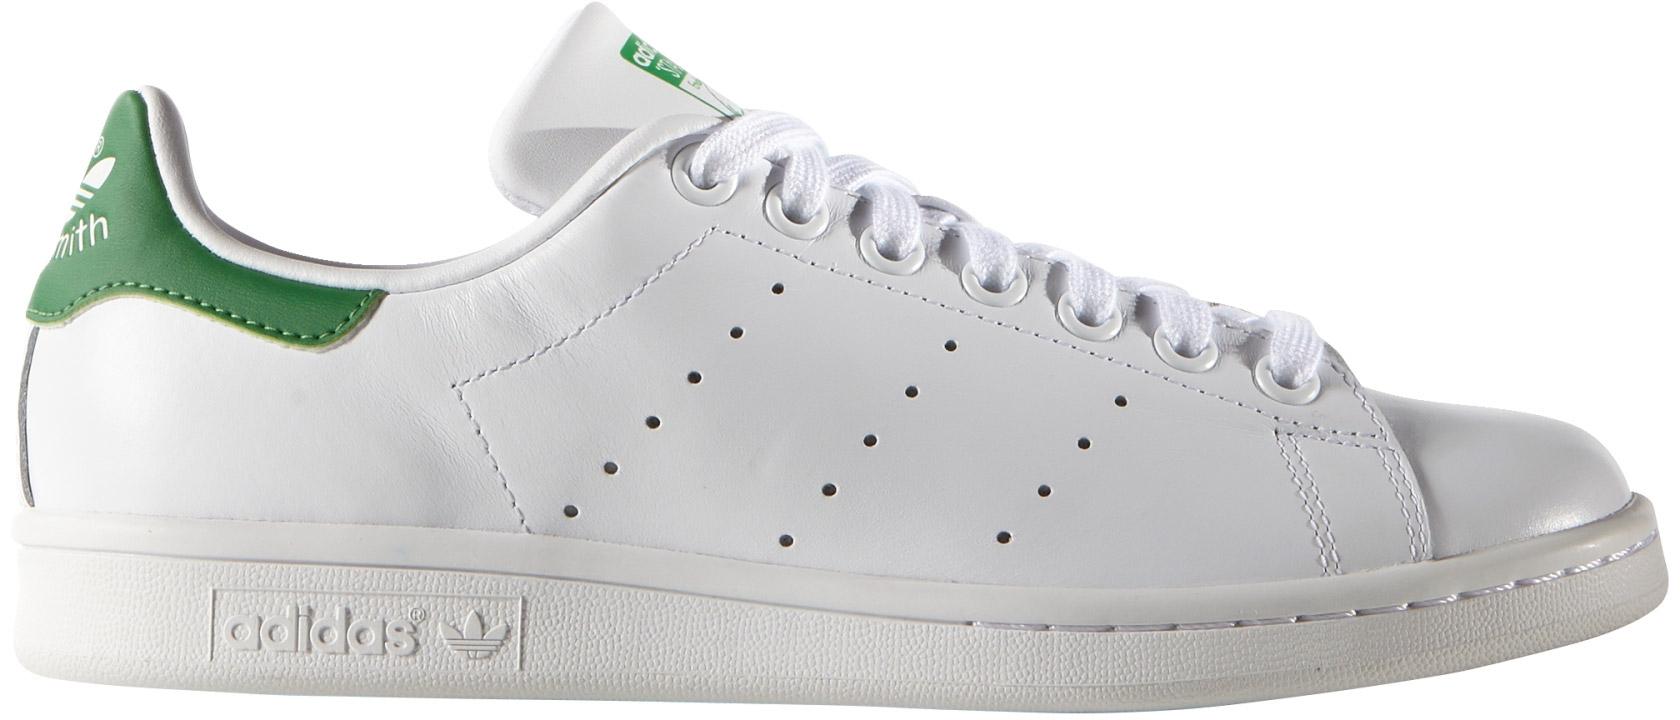 Dicks Tennis Shoes